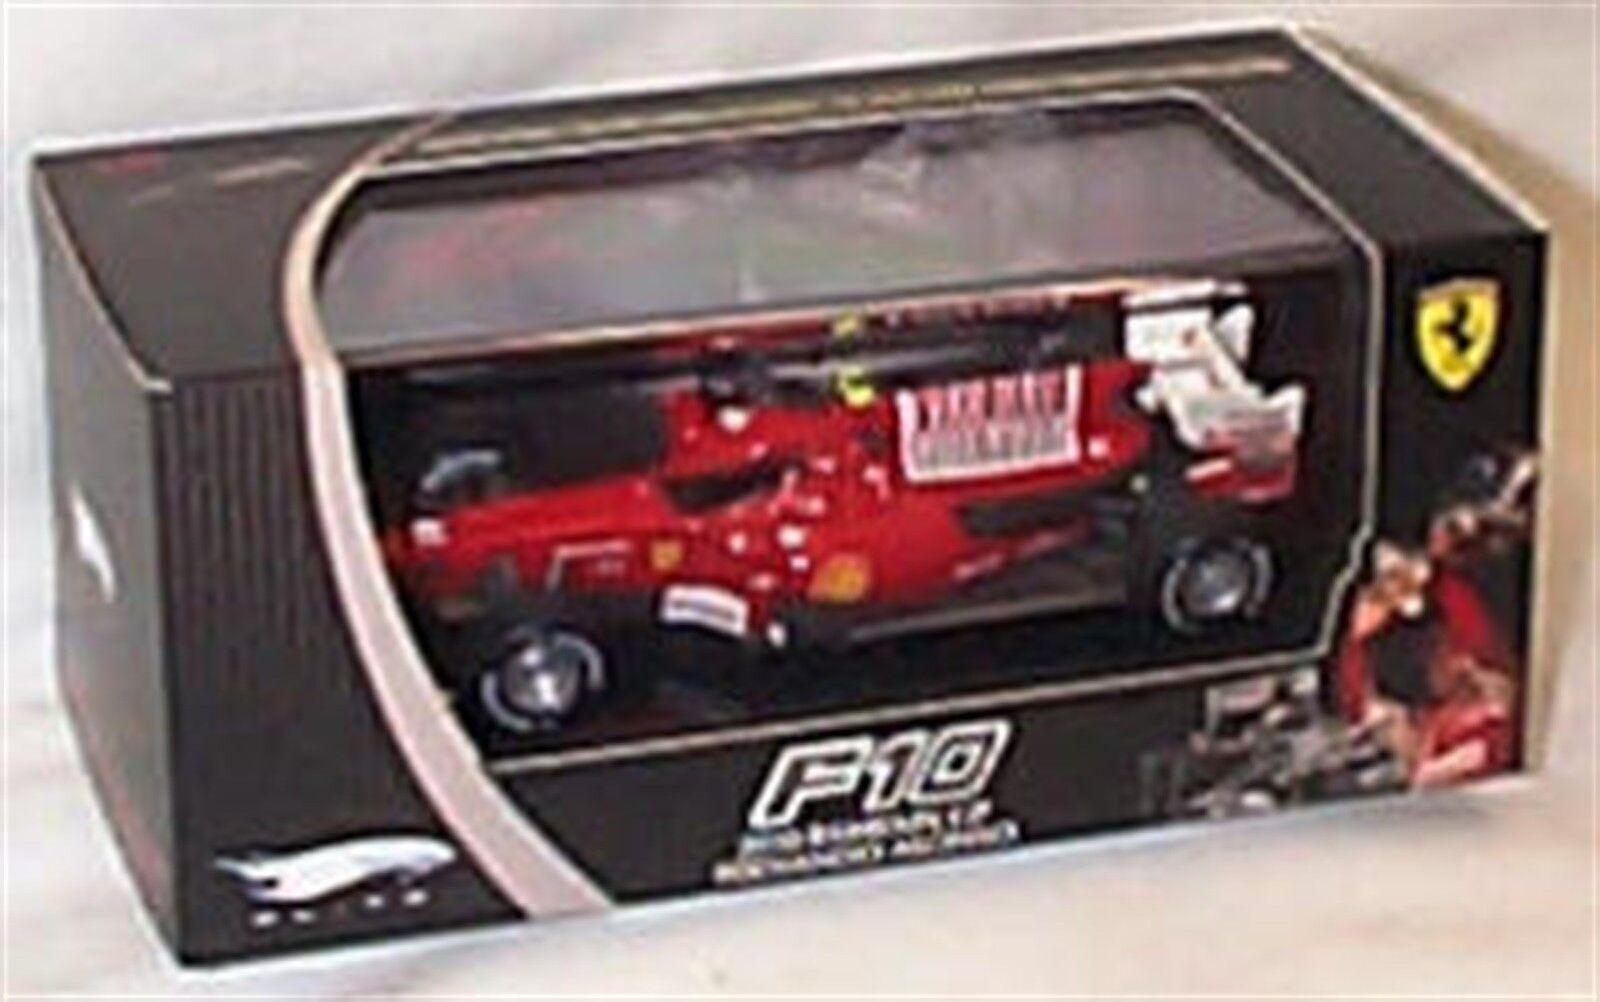 Ferrari F10 2010 Bahrain GP Fernando Alonso 1-43 Scale New in box ltd ed